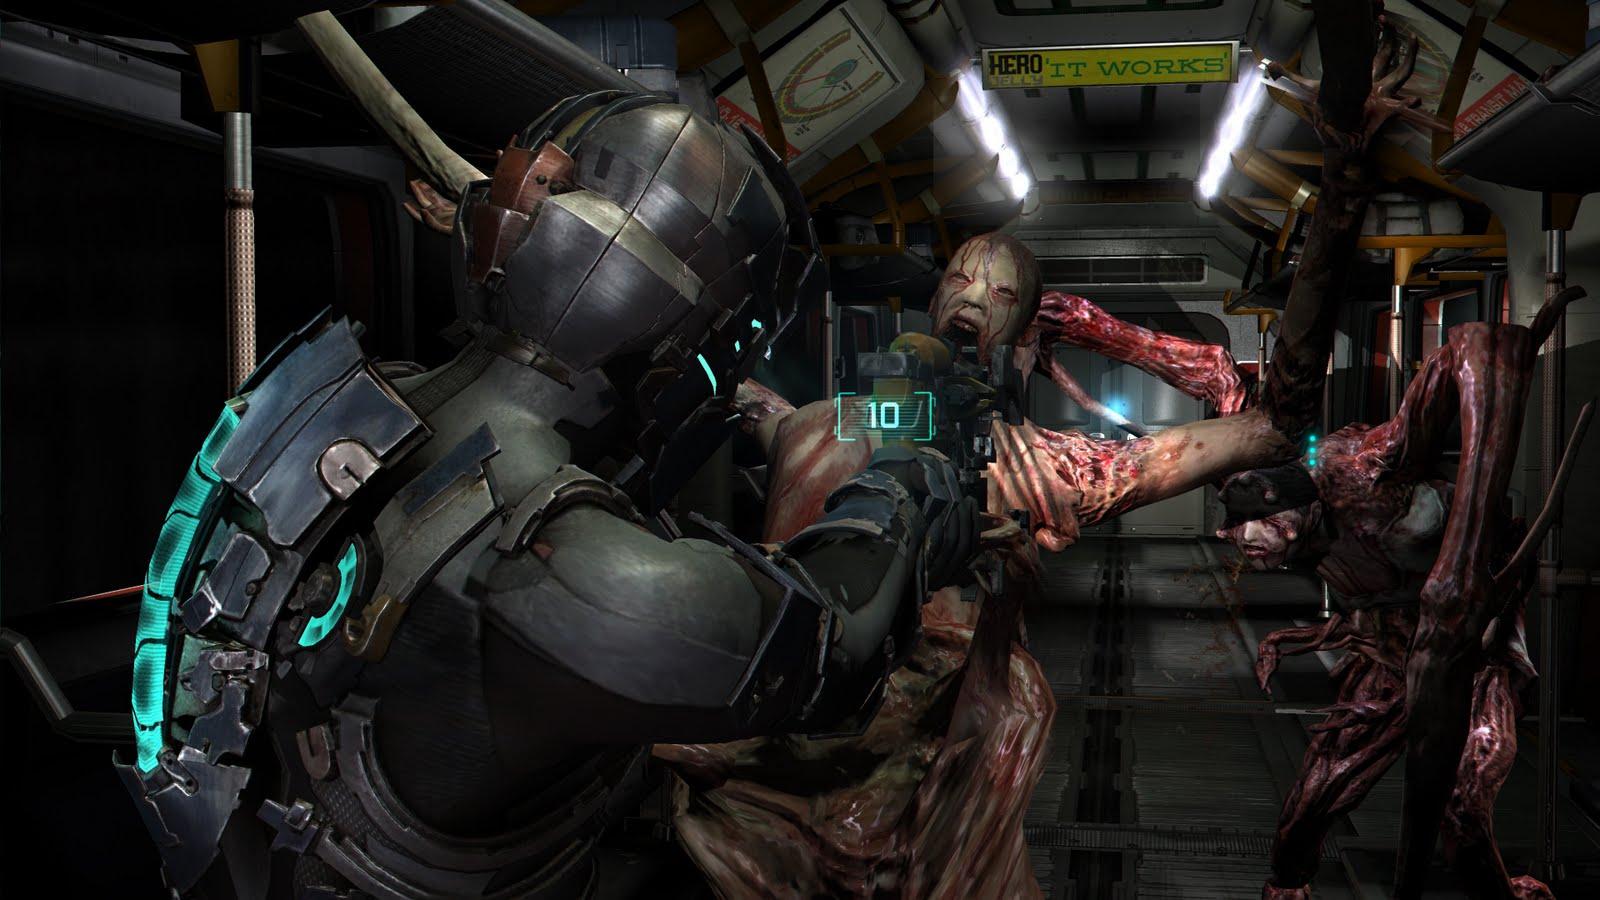 Top HD Wallpapers: Dead Space 2 Wallpapers